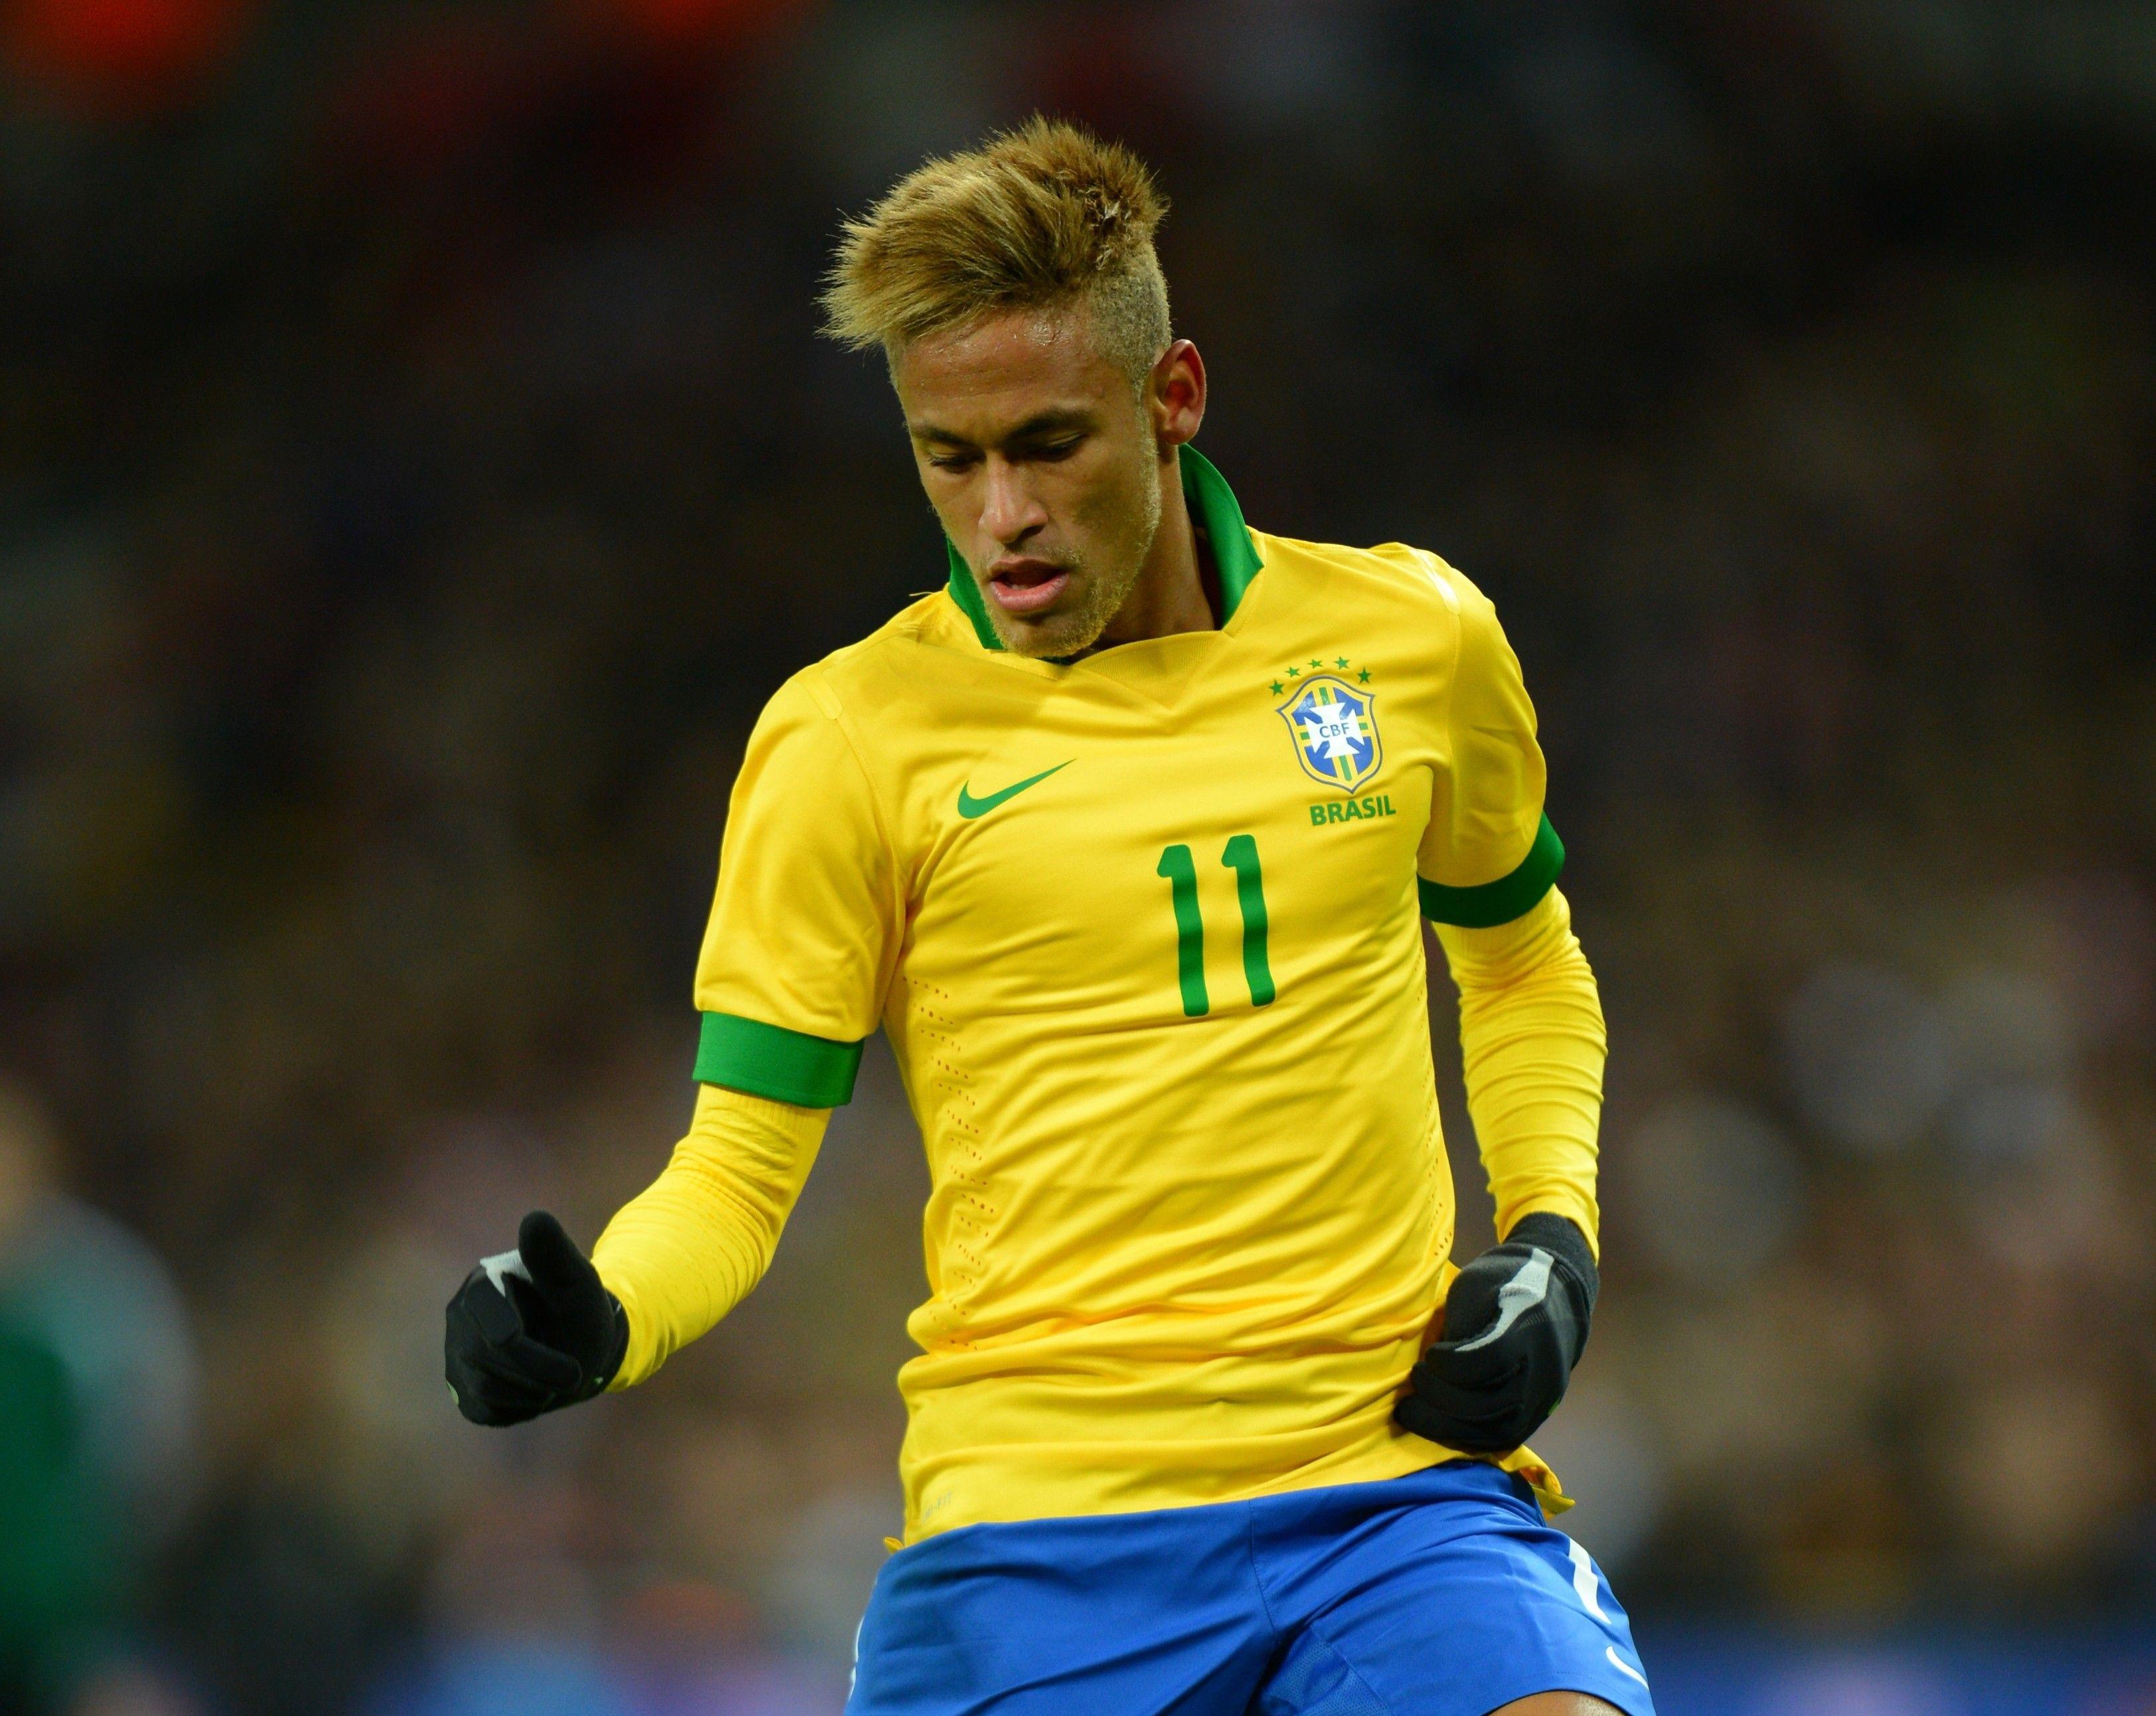 Neymar 2012 Hairstyle Hd Photos Gallery Neymar Neymar 2012 Falcao